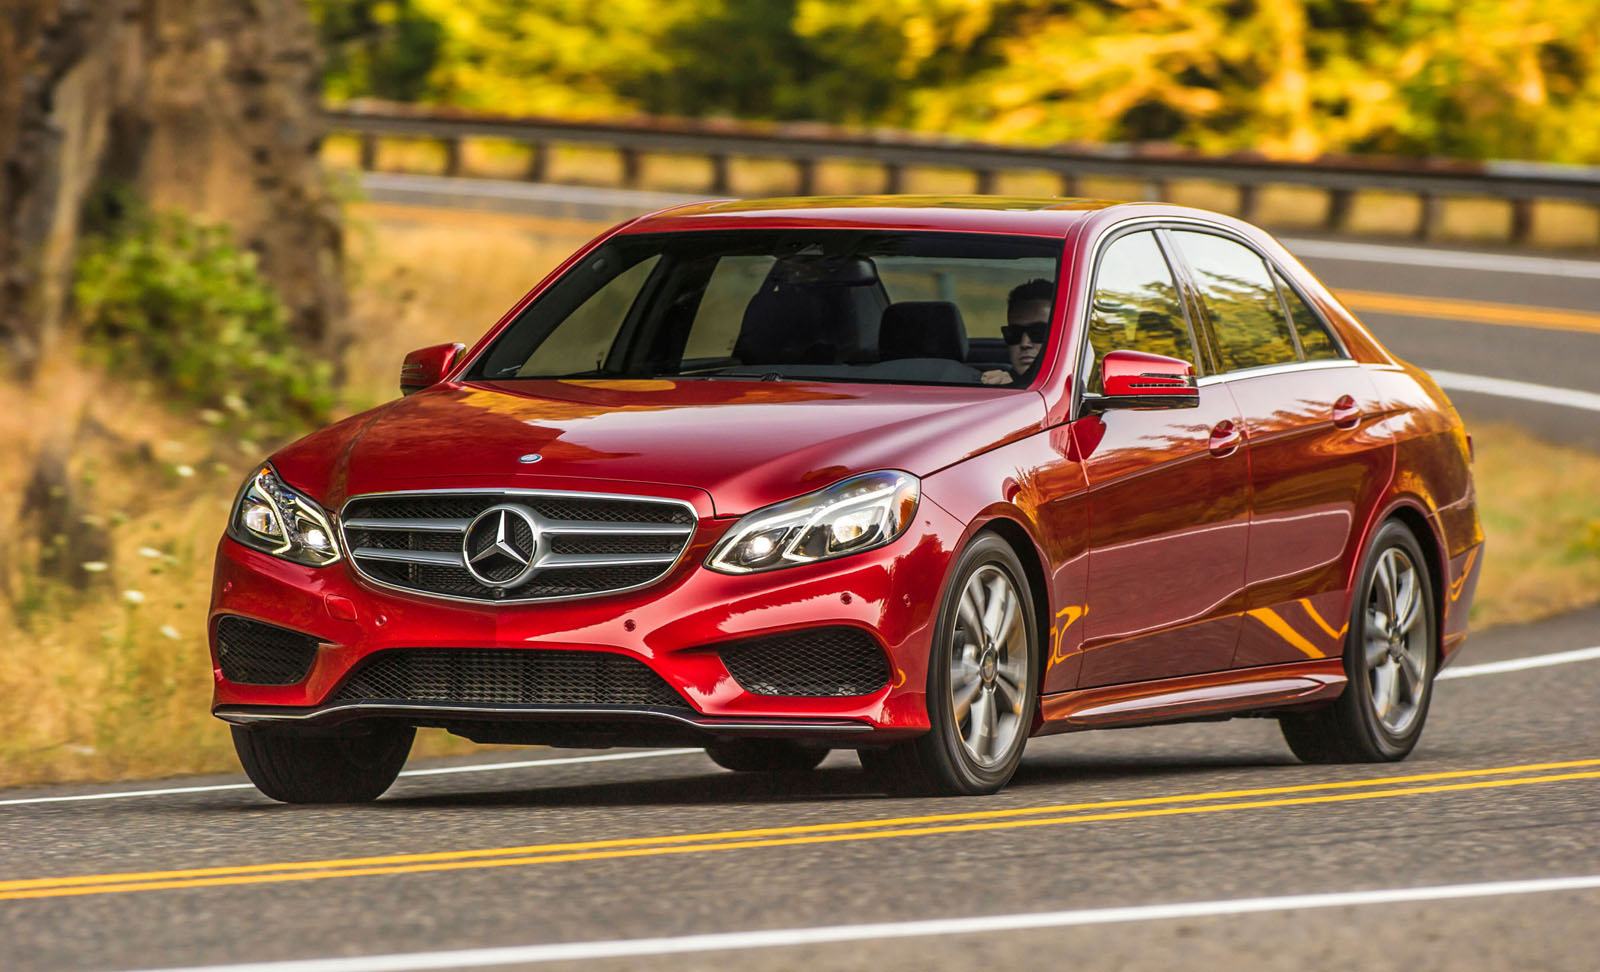 Mercedes benz usa 2014 e250 bluetec mbworld mercedes benz usa 2014 e250 bluetec altavistaventures Image collections